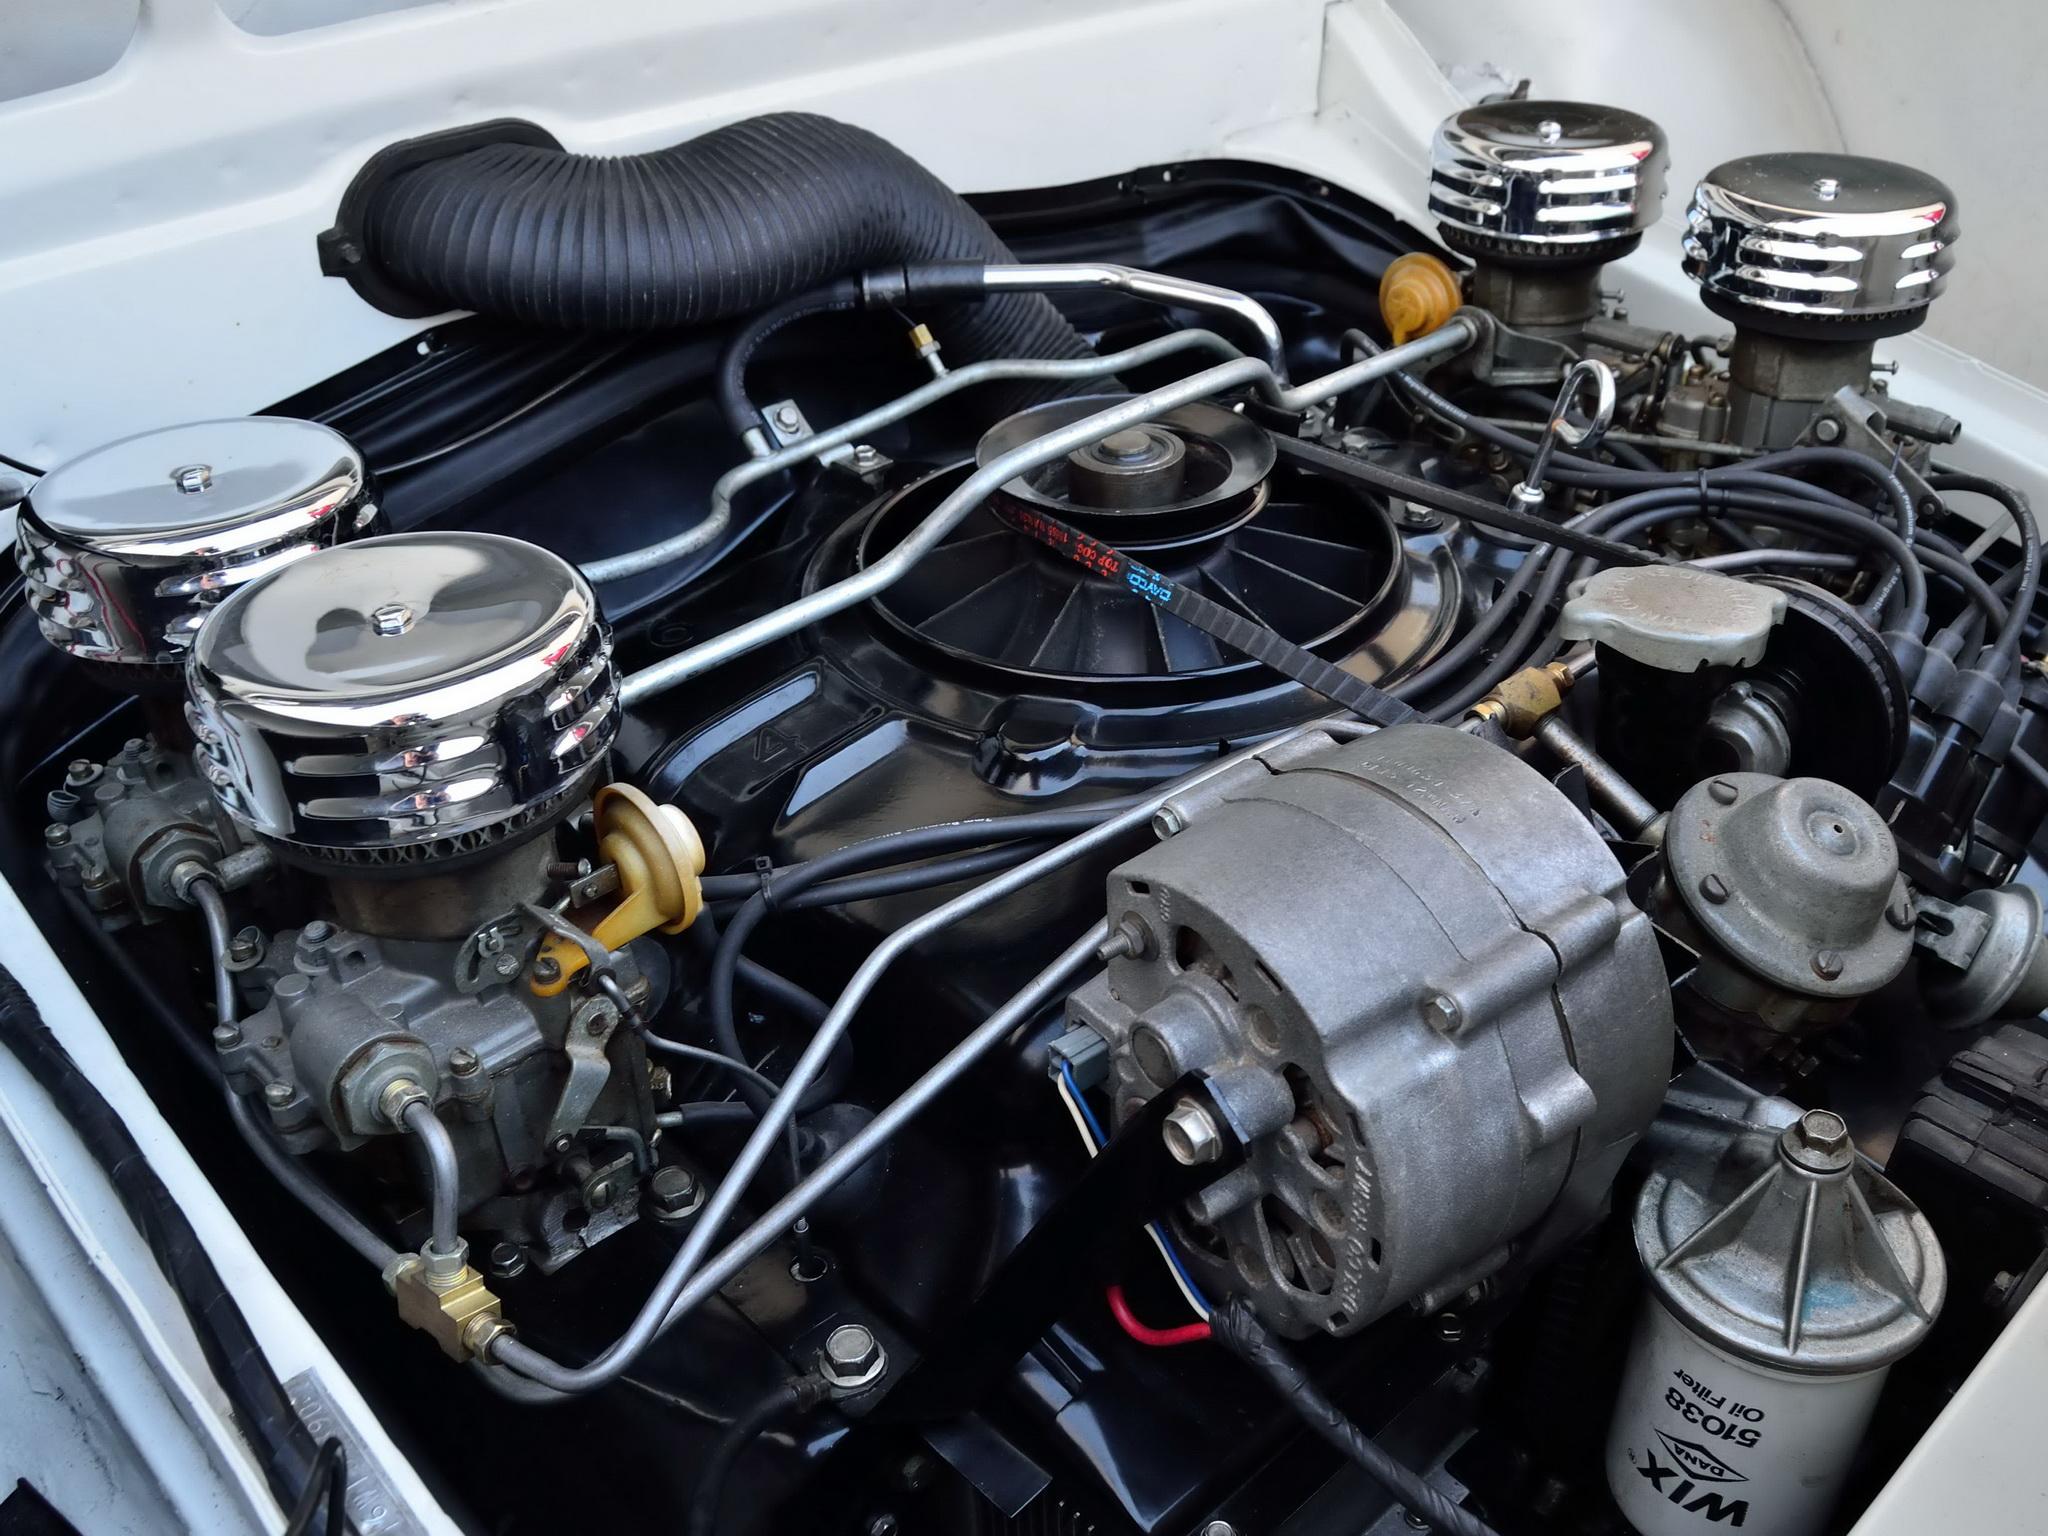 IM M2 AutoMods 1968 Chevy Camaro Super Chase at Hobby